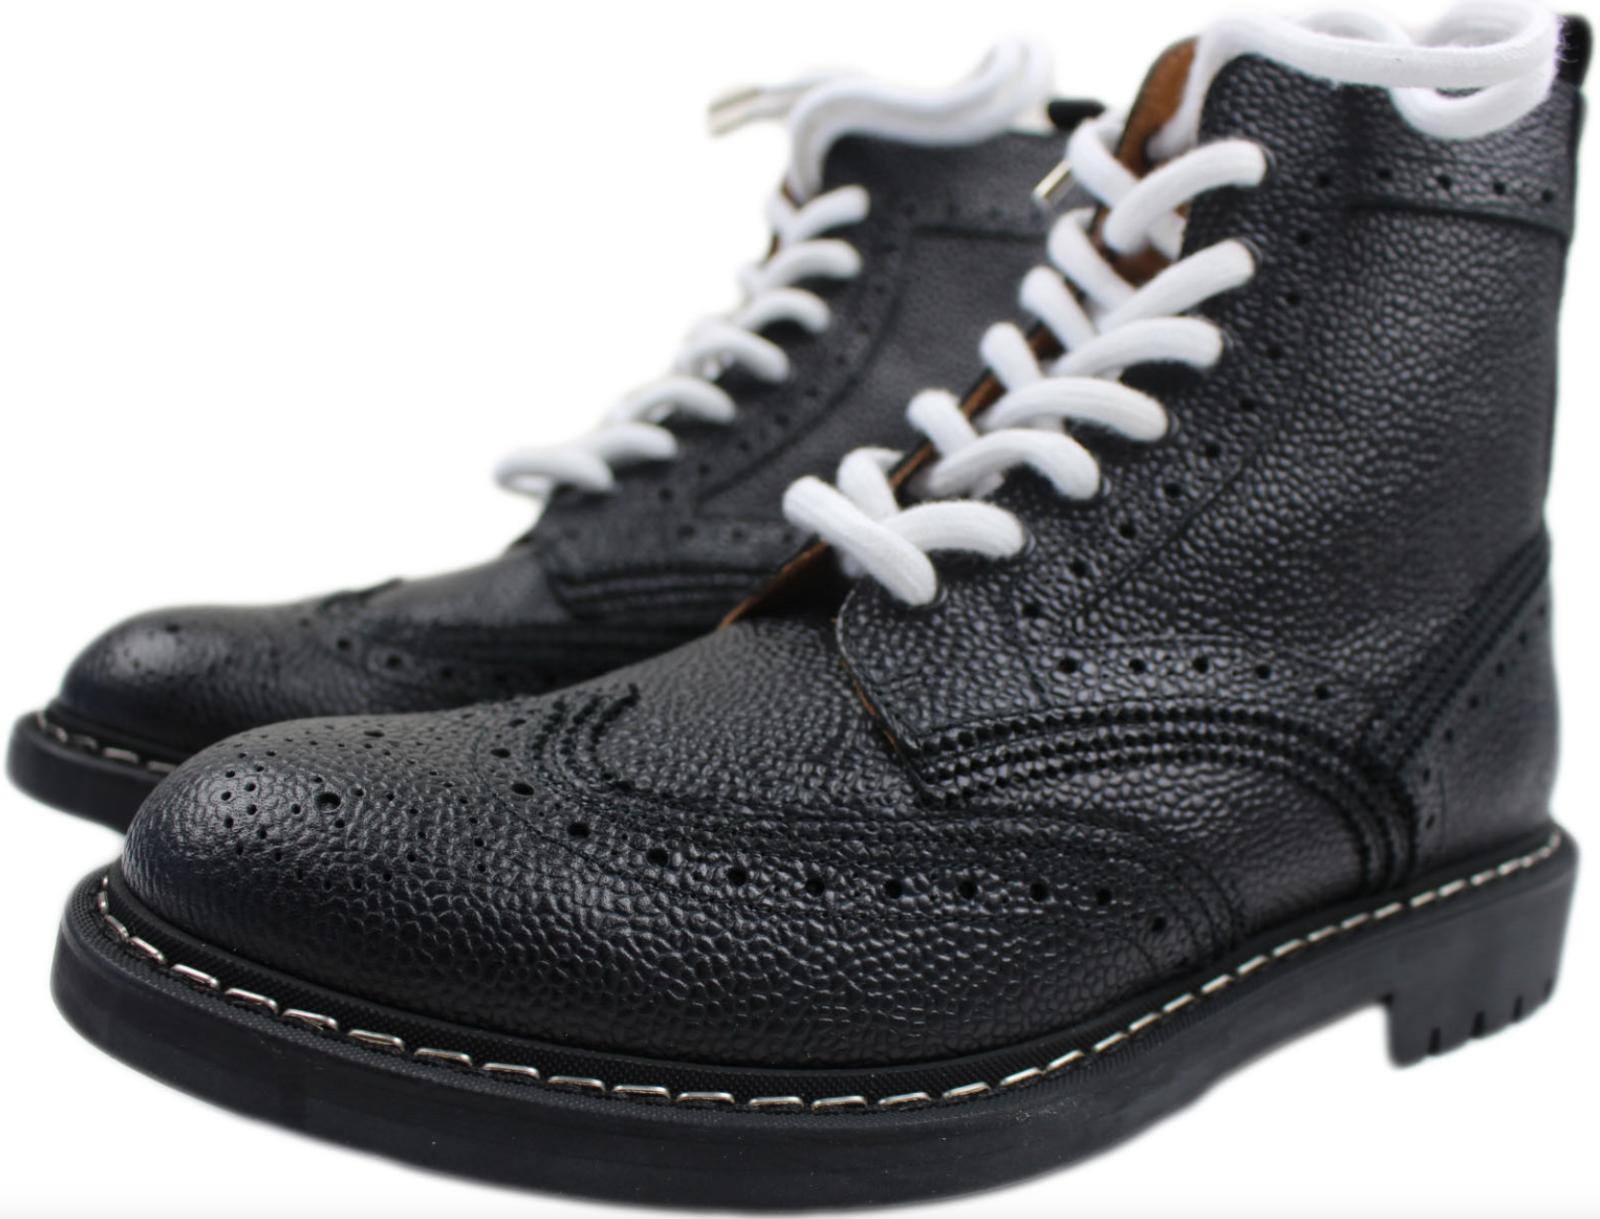 GIVENCHY PARIS herren schwarz COMMANDO PEBBLE RUNWAY Stiefel Größe 7D US  40